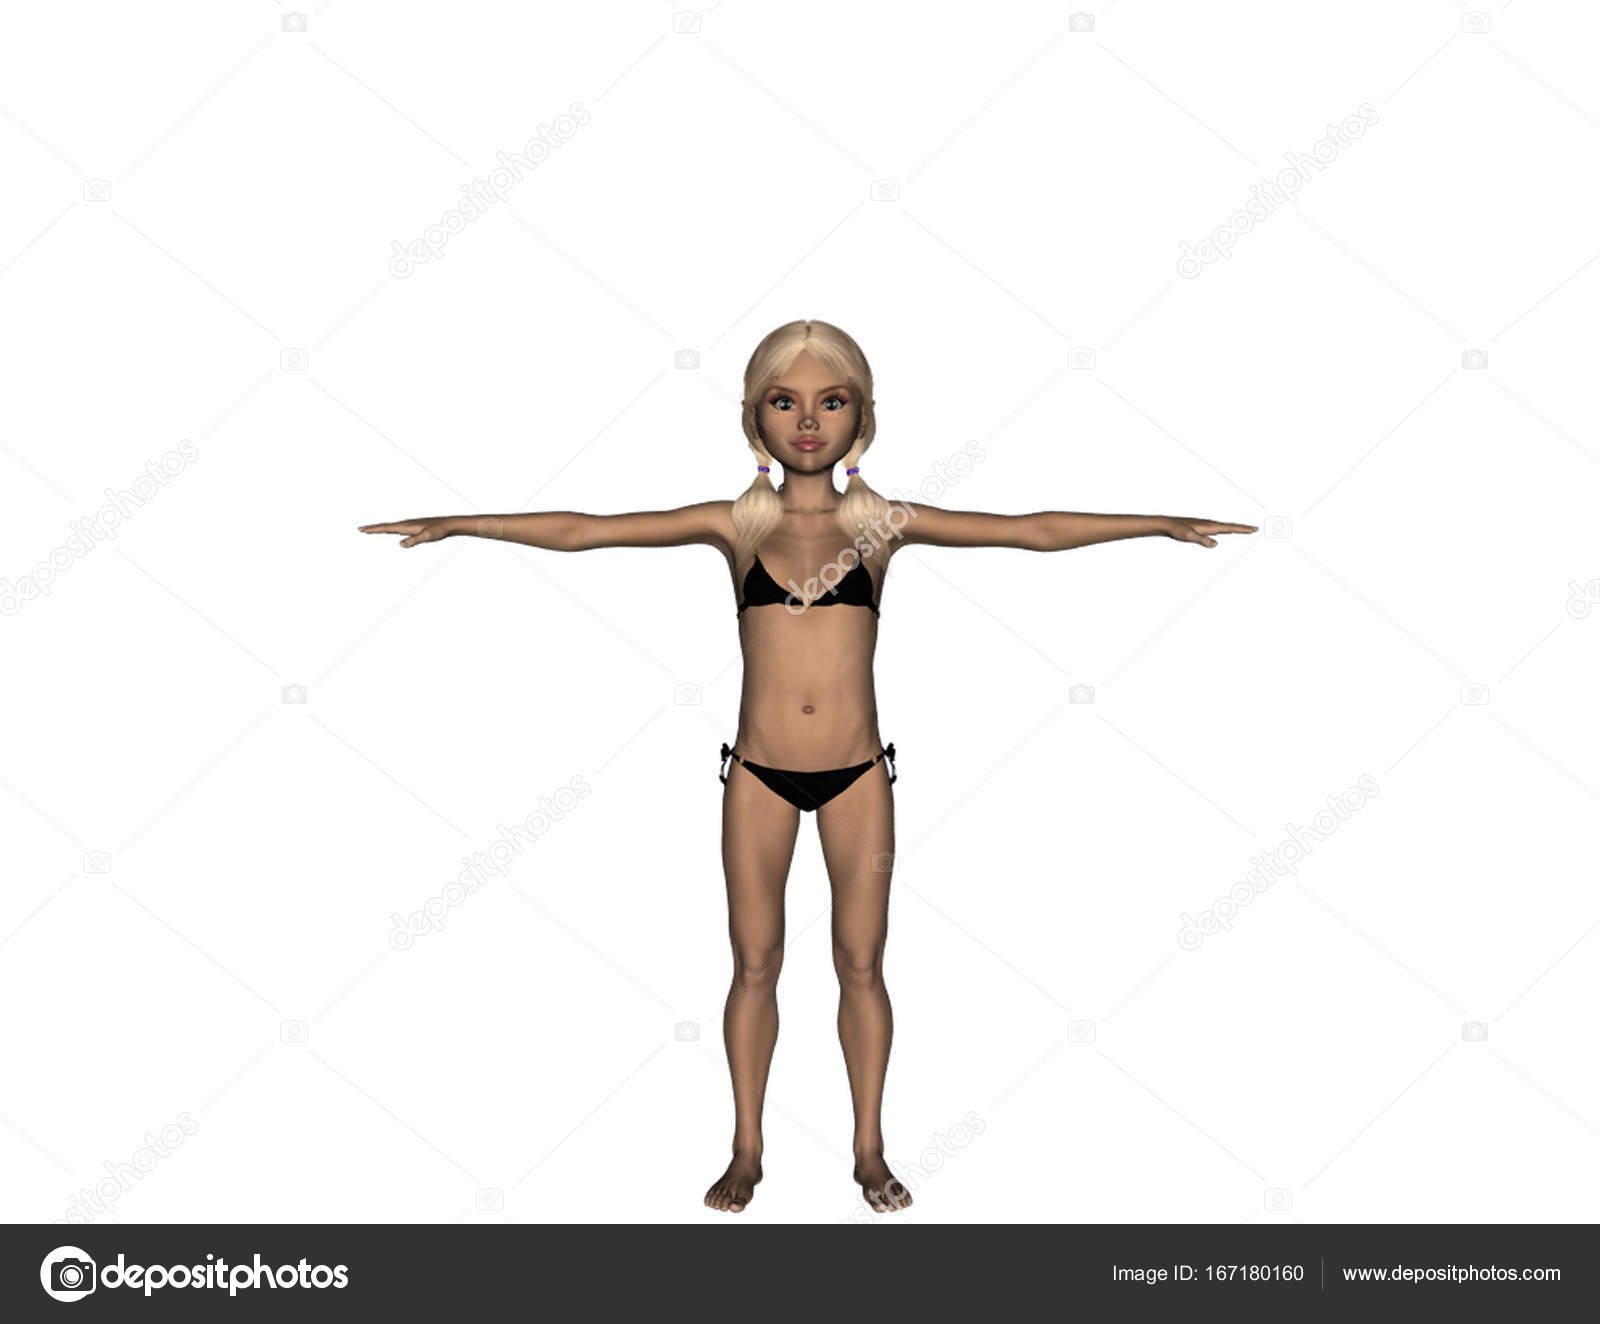 Costumi Da Bagno Per Ragazze 13 Anni : Ragazza in costume da bagno cresce a anni u foto stock